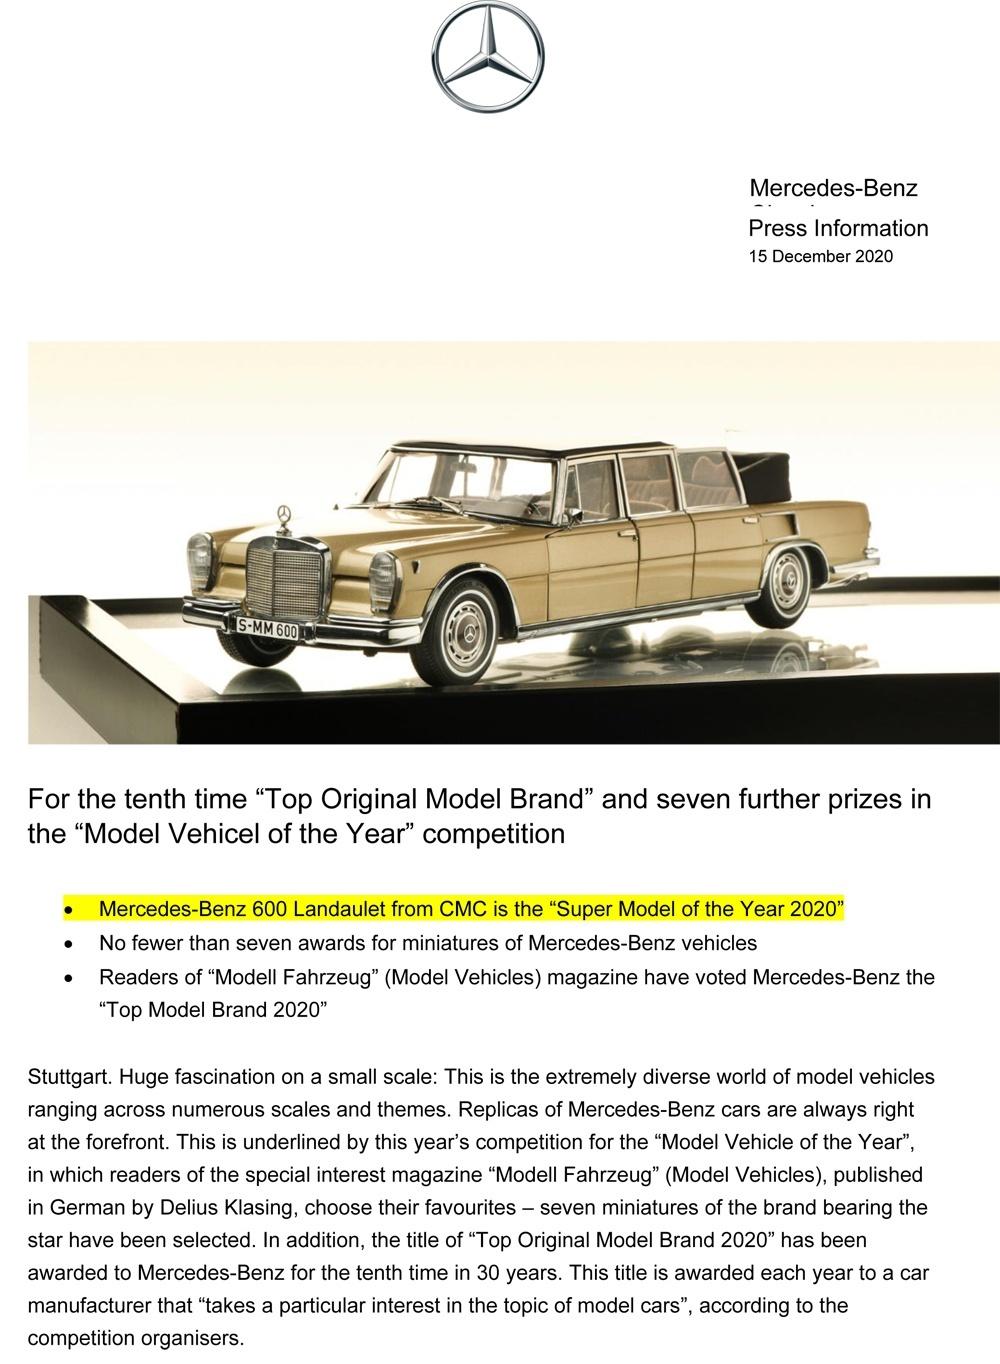 Mercedes Benz Presse Information 15.12.2020 En